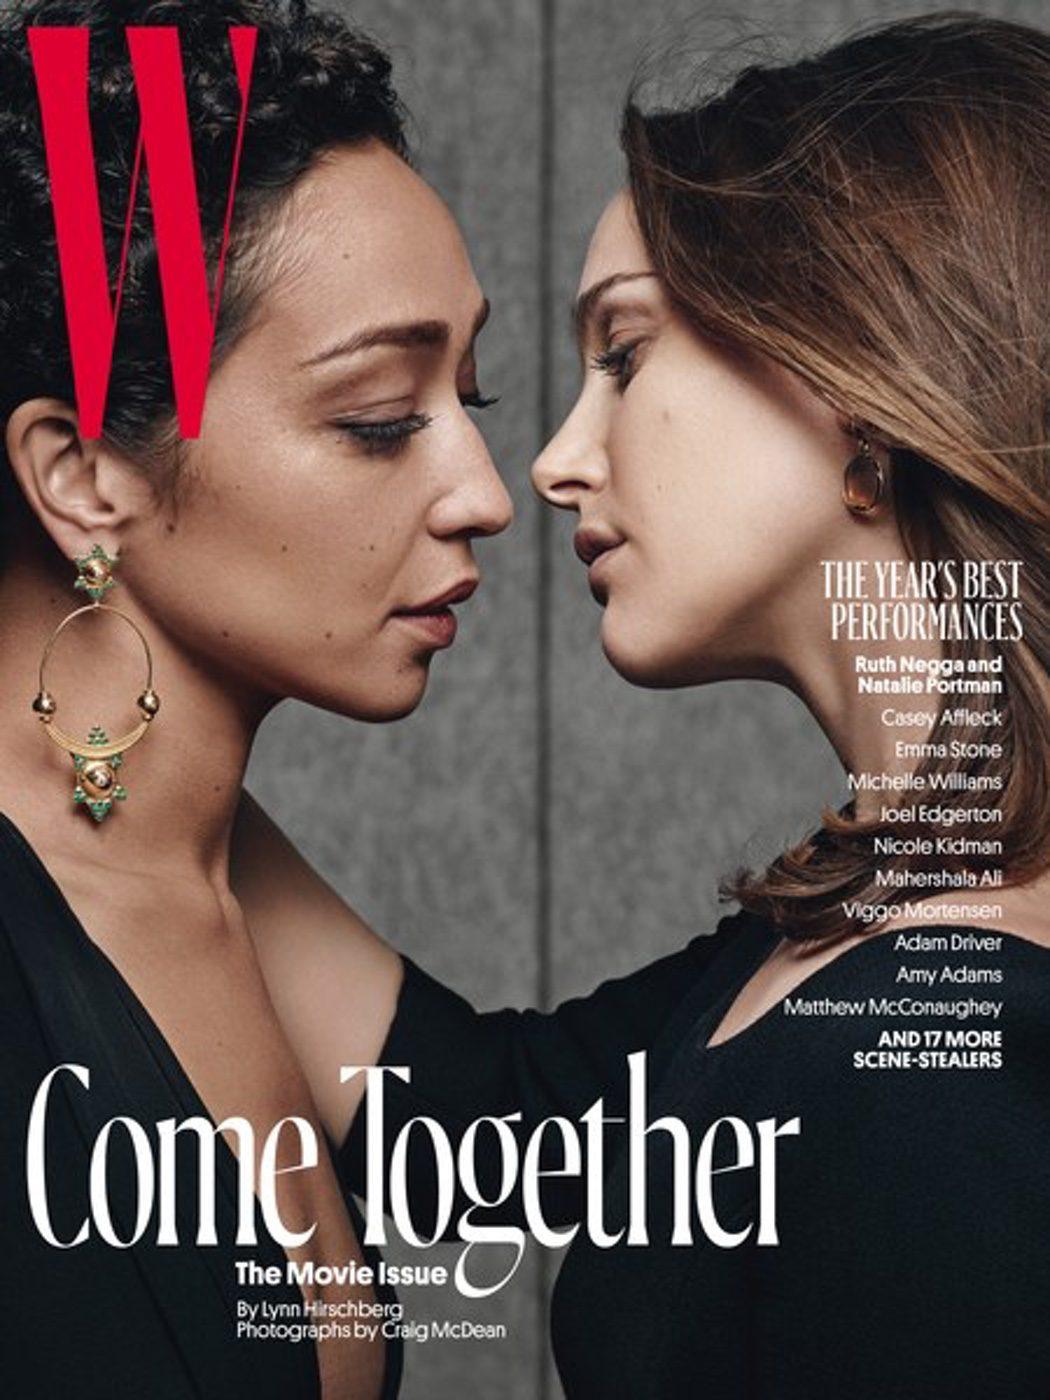 Ruth Negga y Natalie Portman